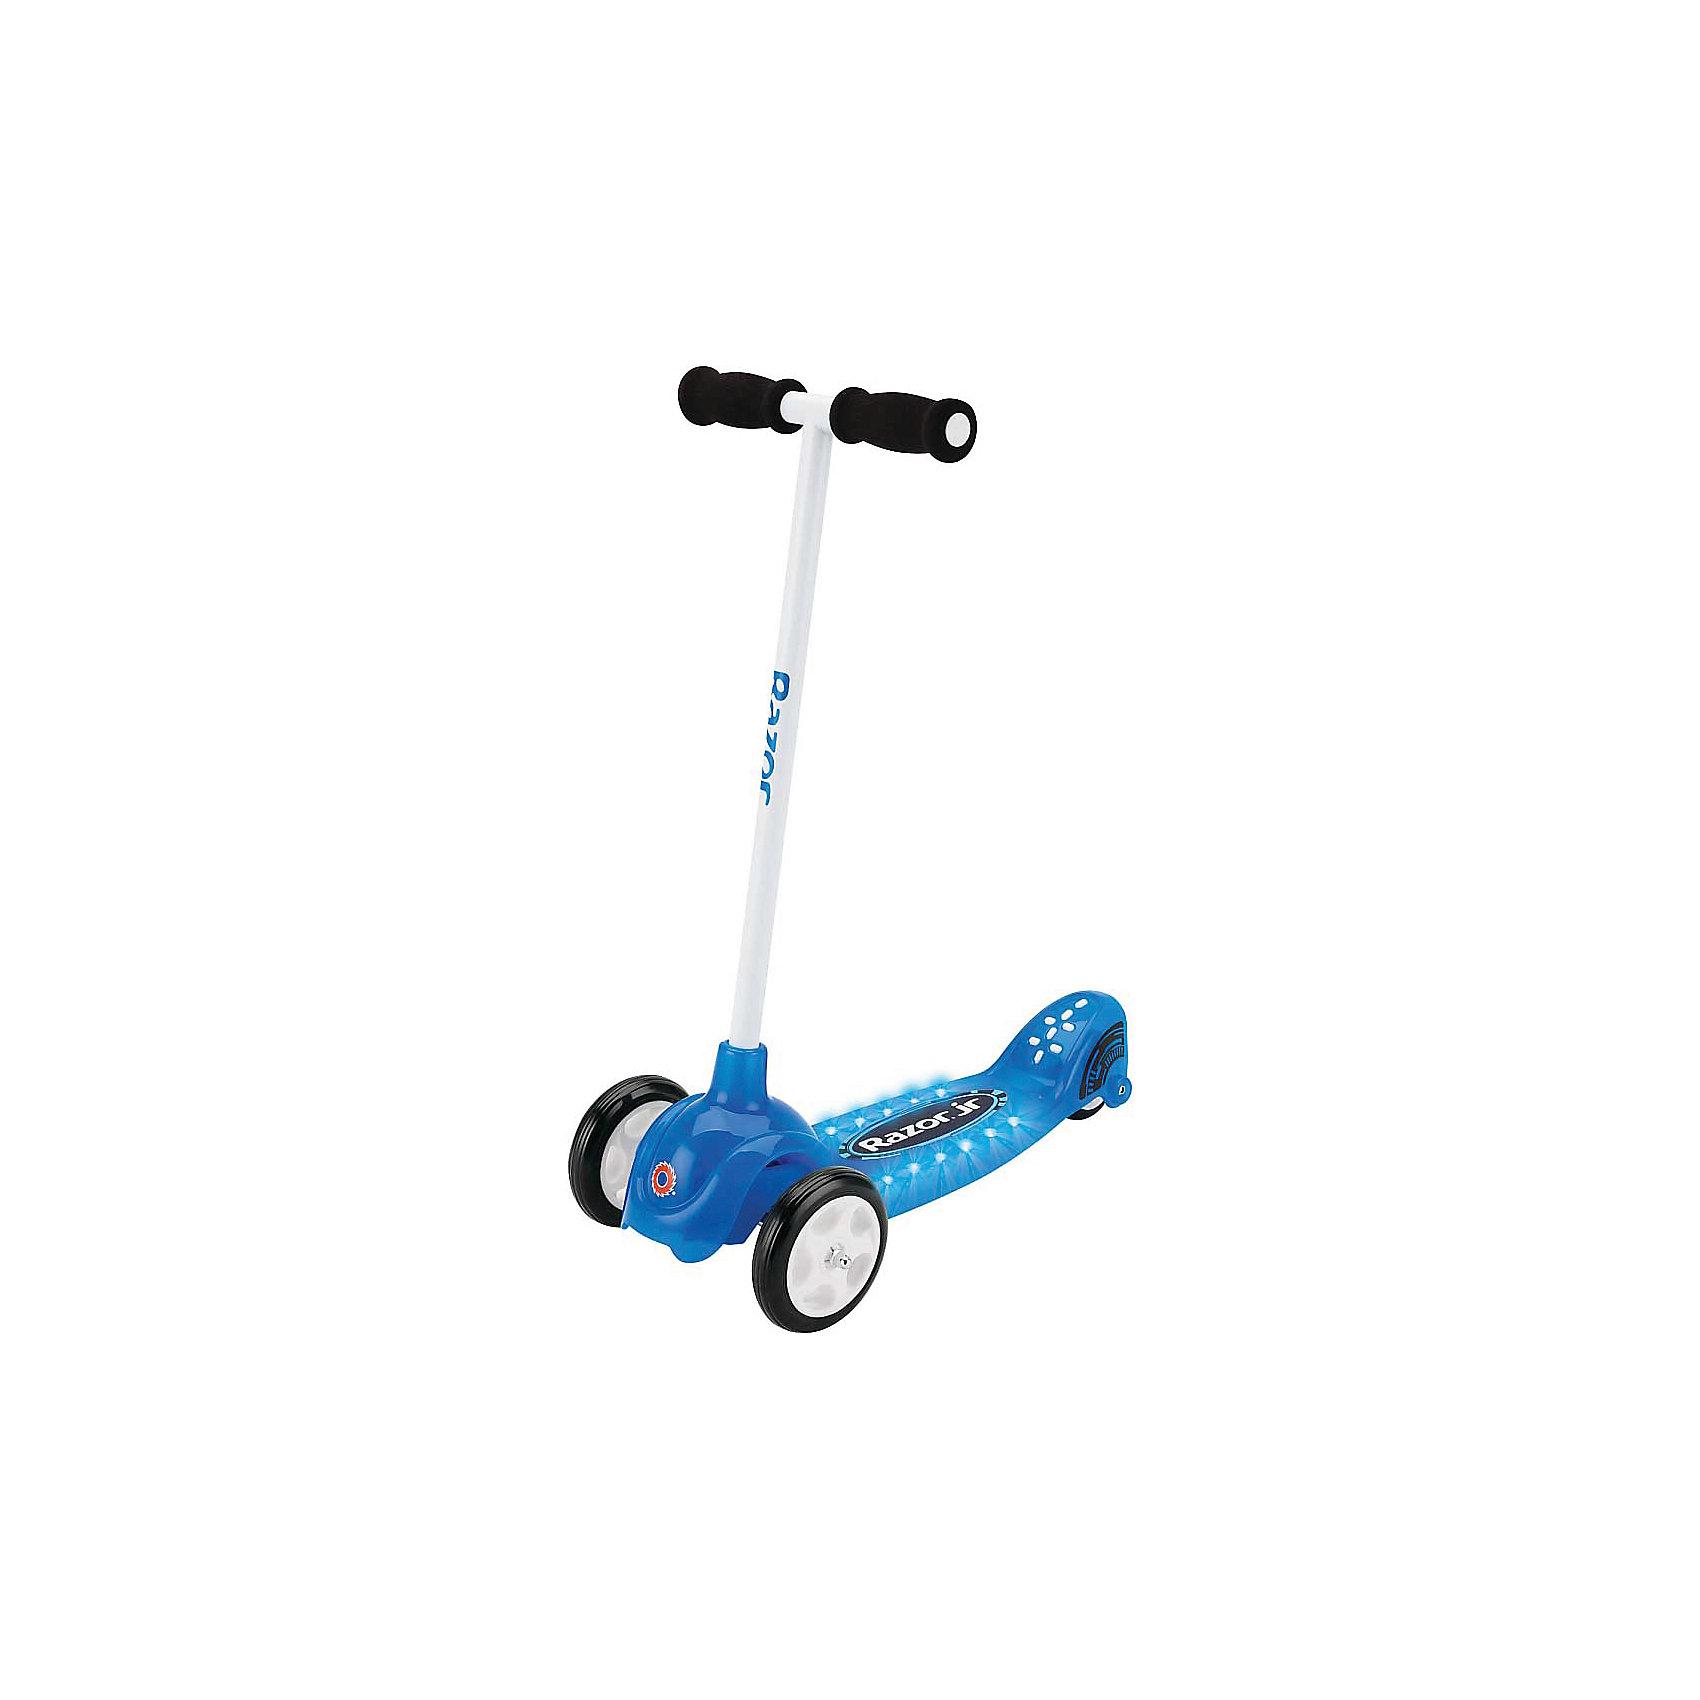 Razor Детский трёхколёсный самокат Lil Tek, синий, Razor детский самокат fenix cms031